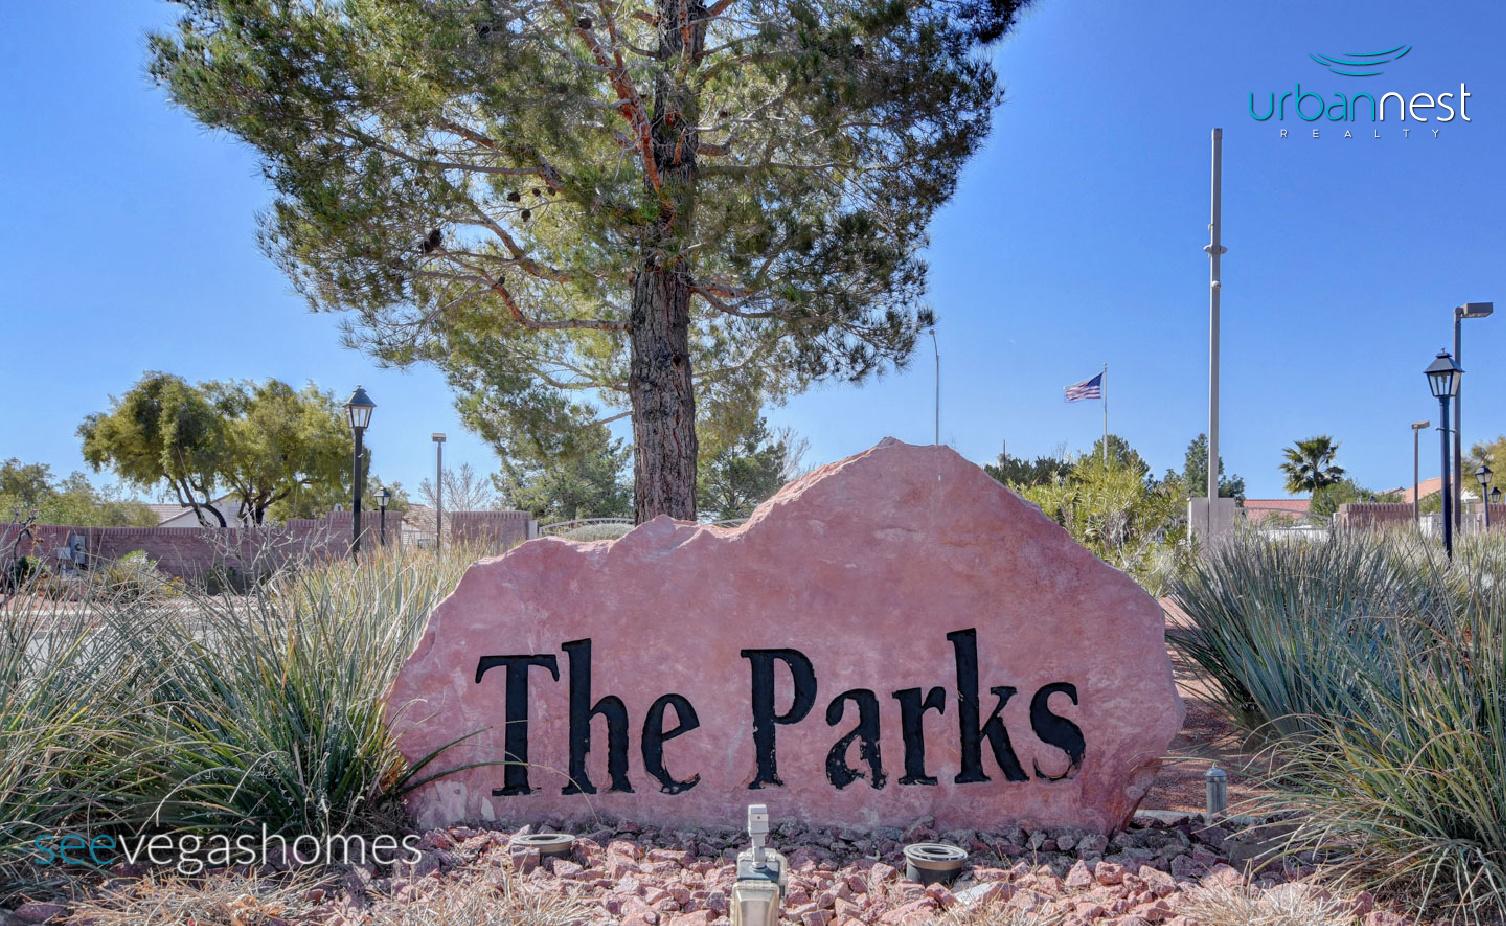 The_Parks_North_Las_Vegas_NV_89084_SeeVegasHomes_1